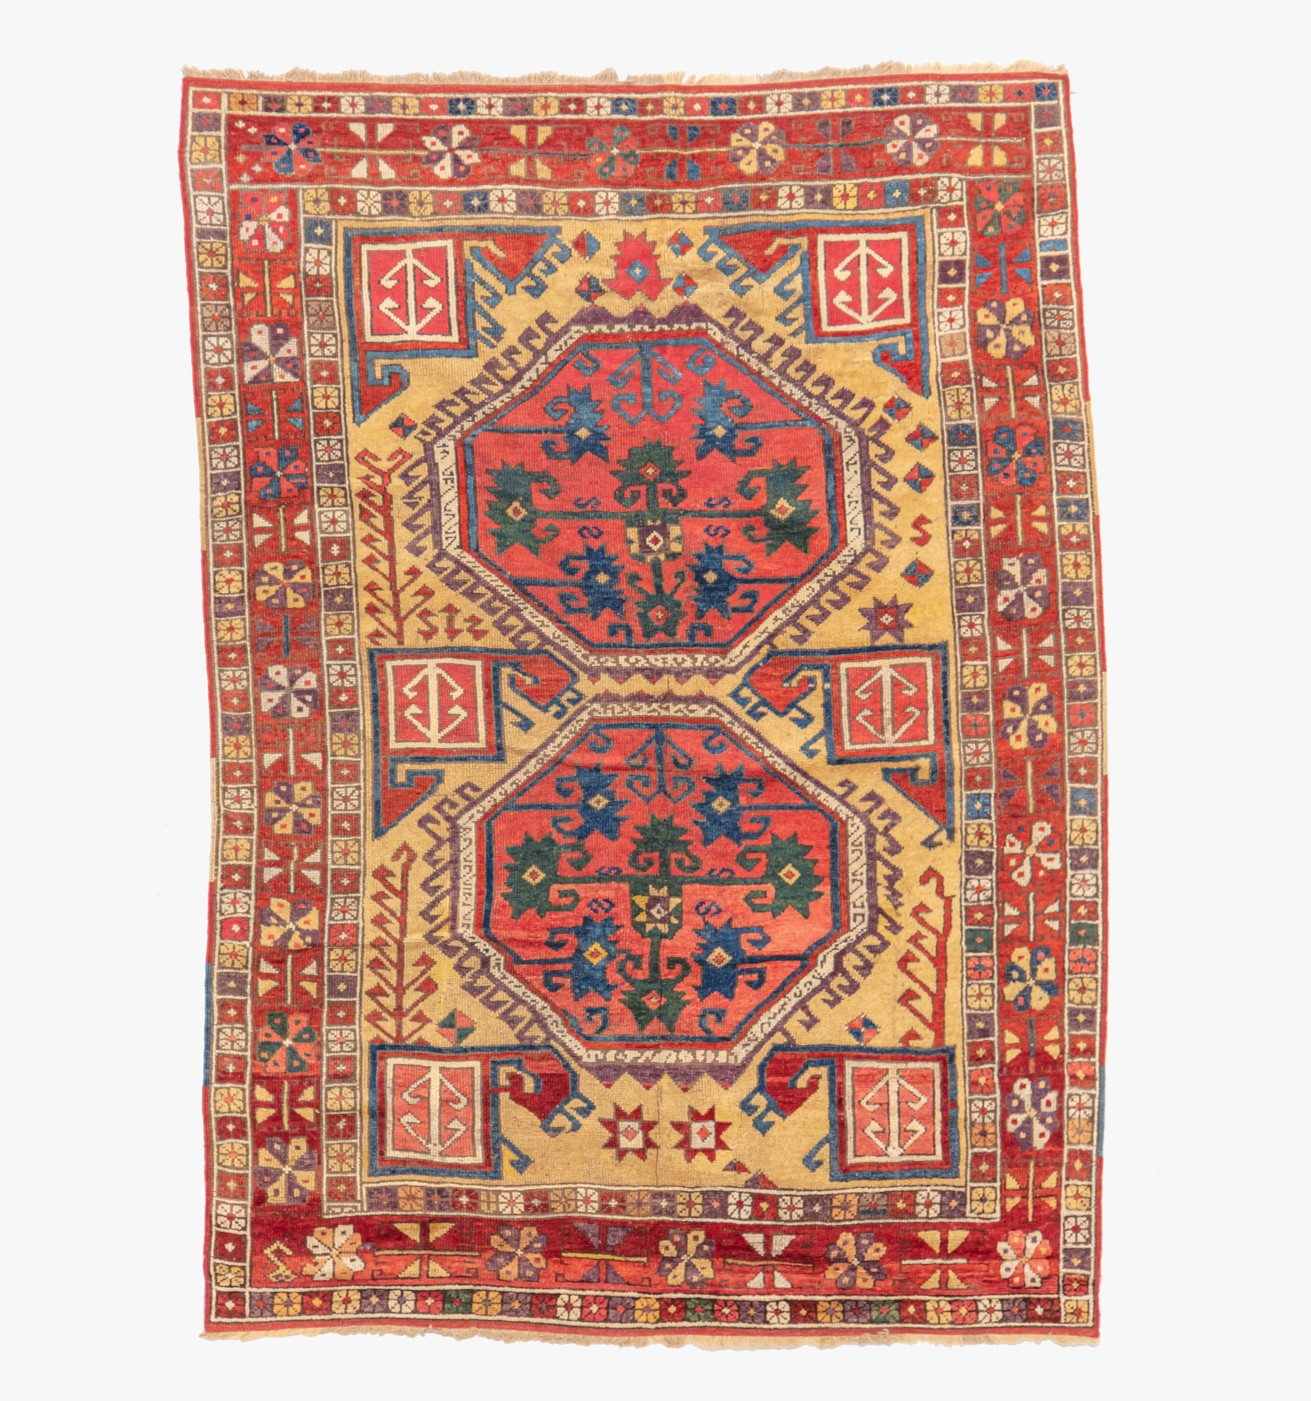 A rare 18th Century Konya carpet